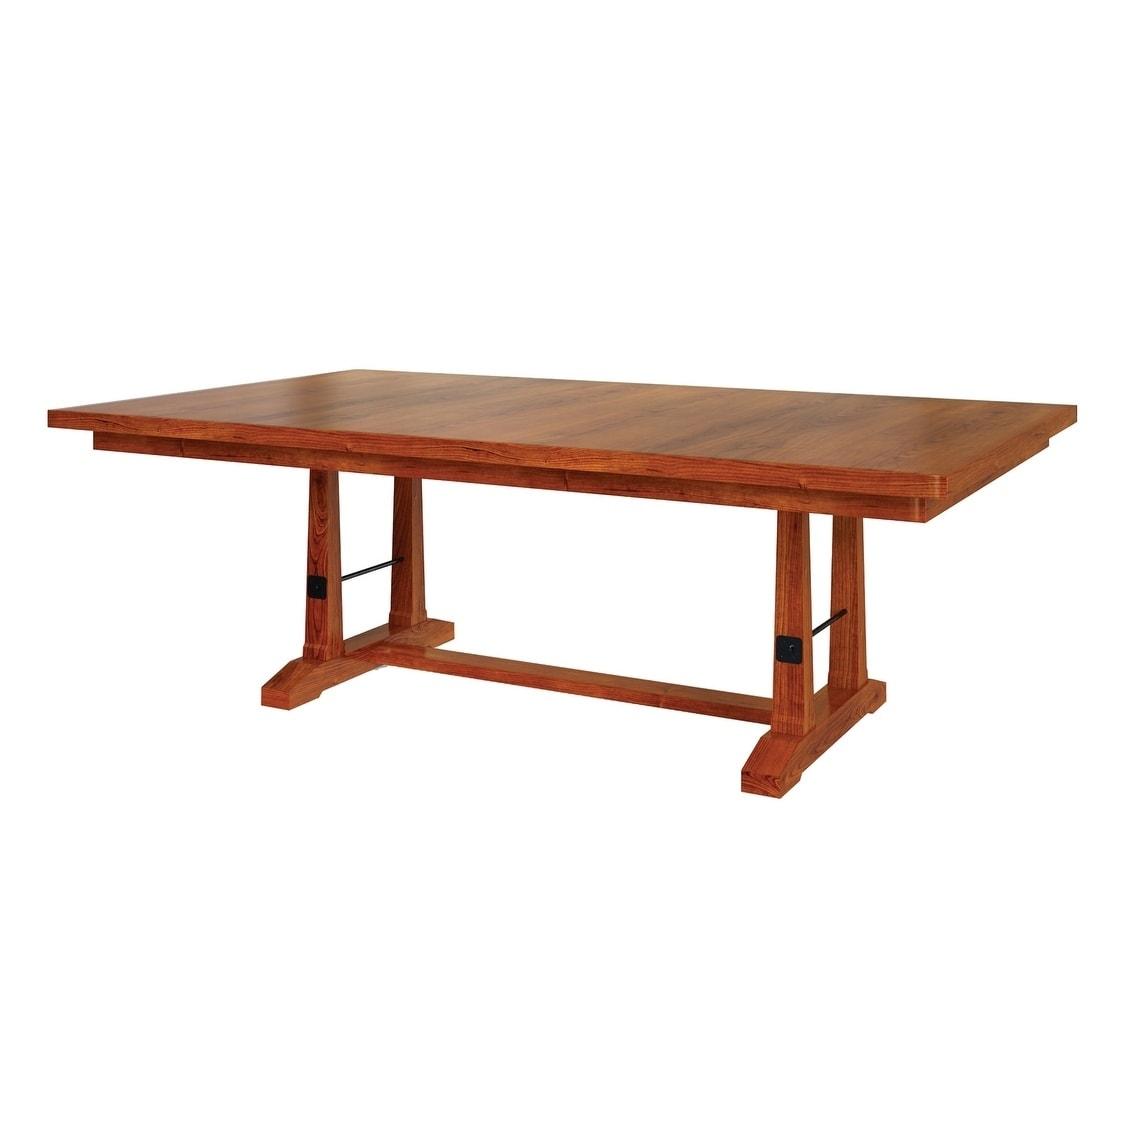 Carla Elizabeth Double Pedestal 6 Ft Dining Table W One 18 Erfly Leaf